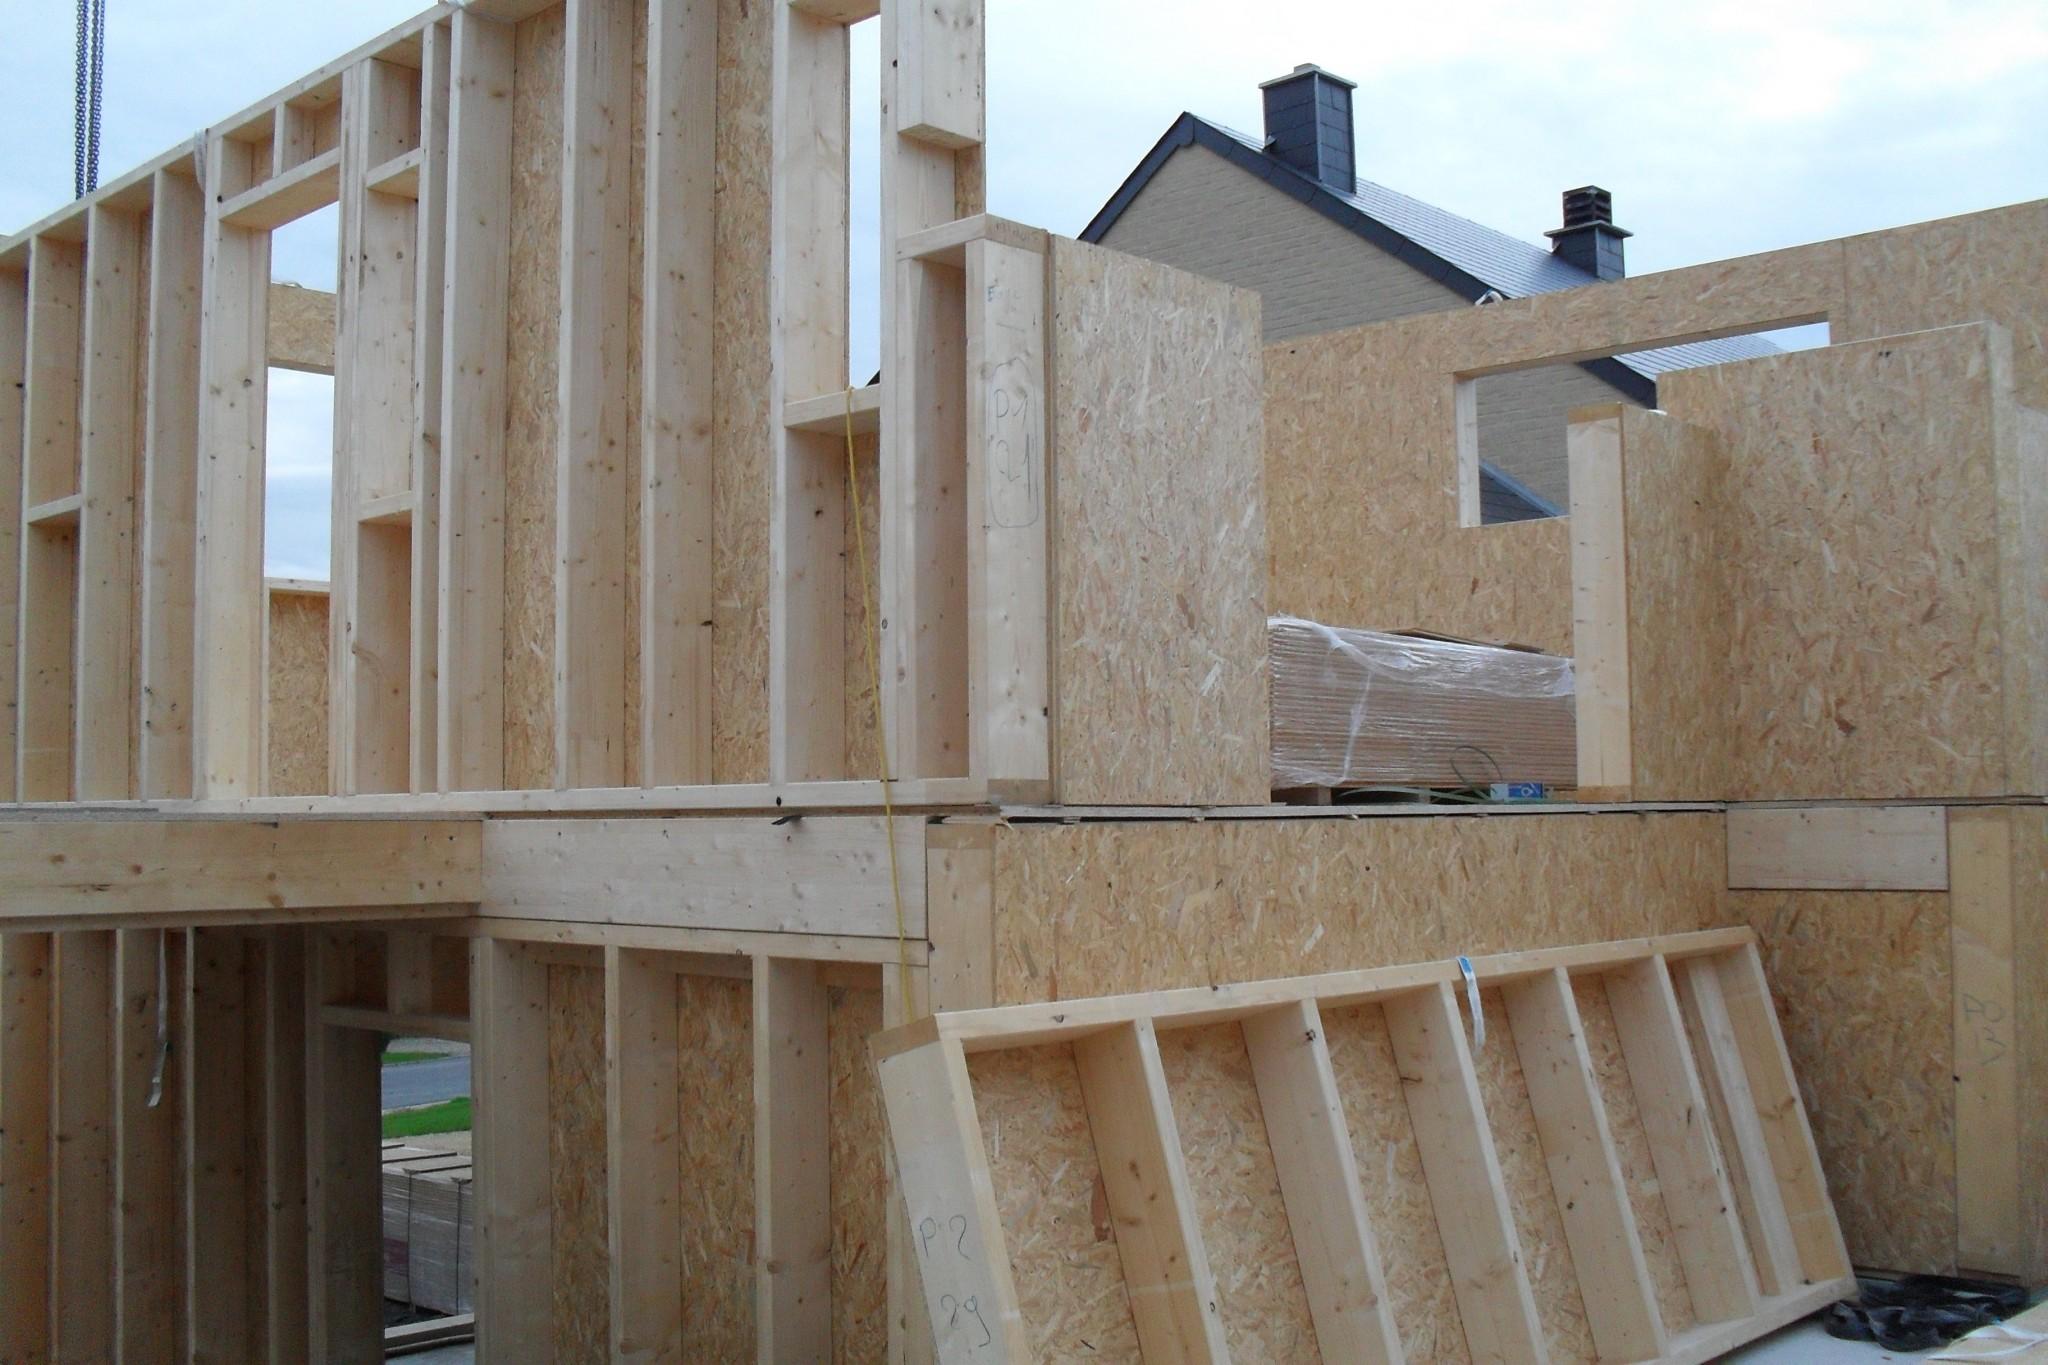 architecte thierry noben luxembourg bois